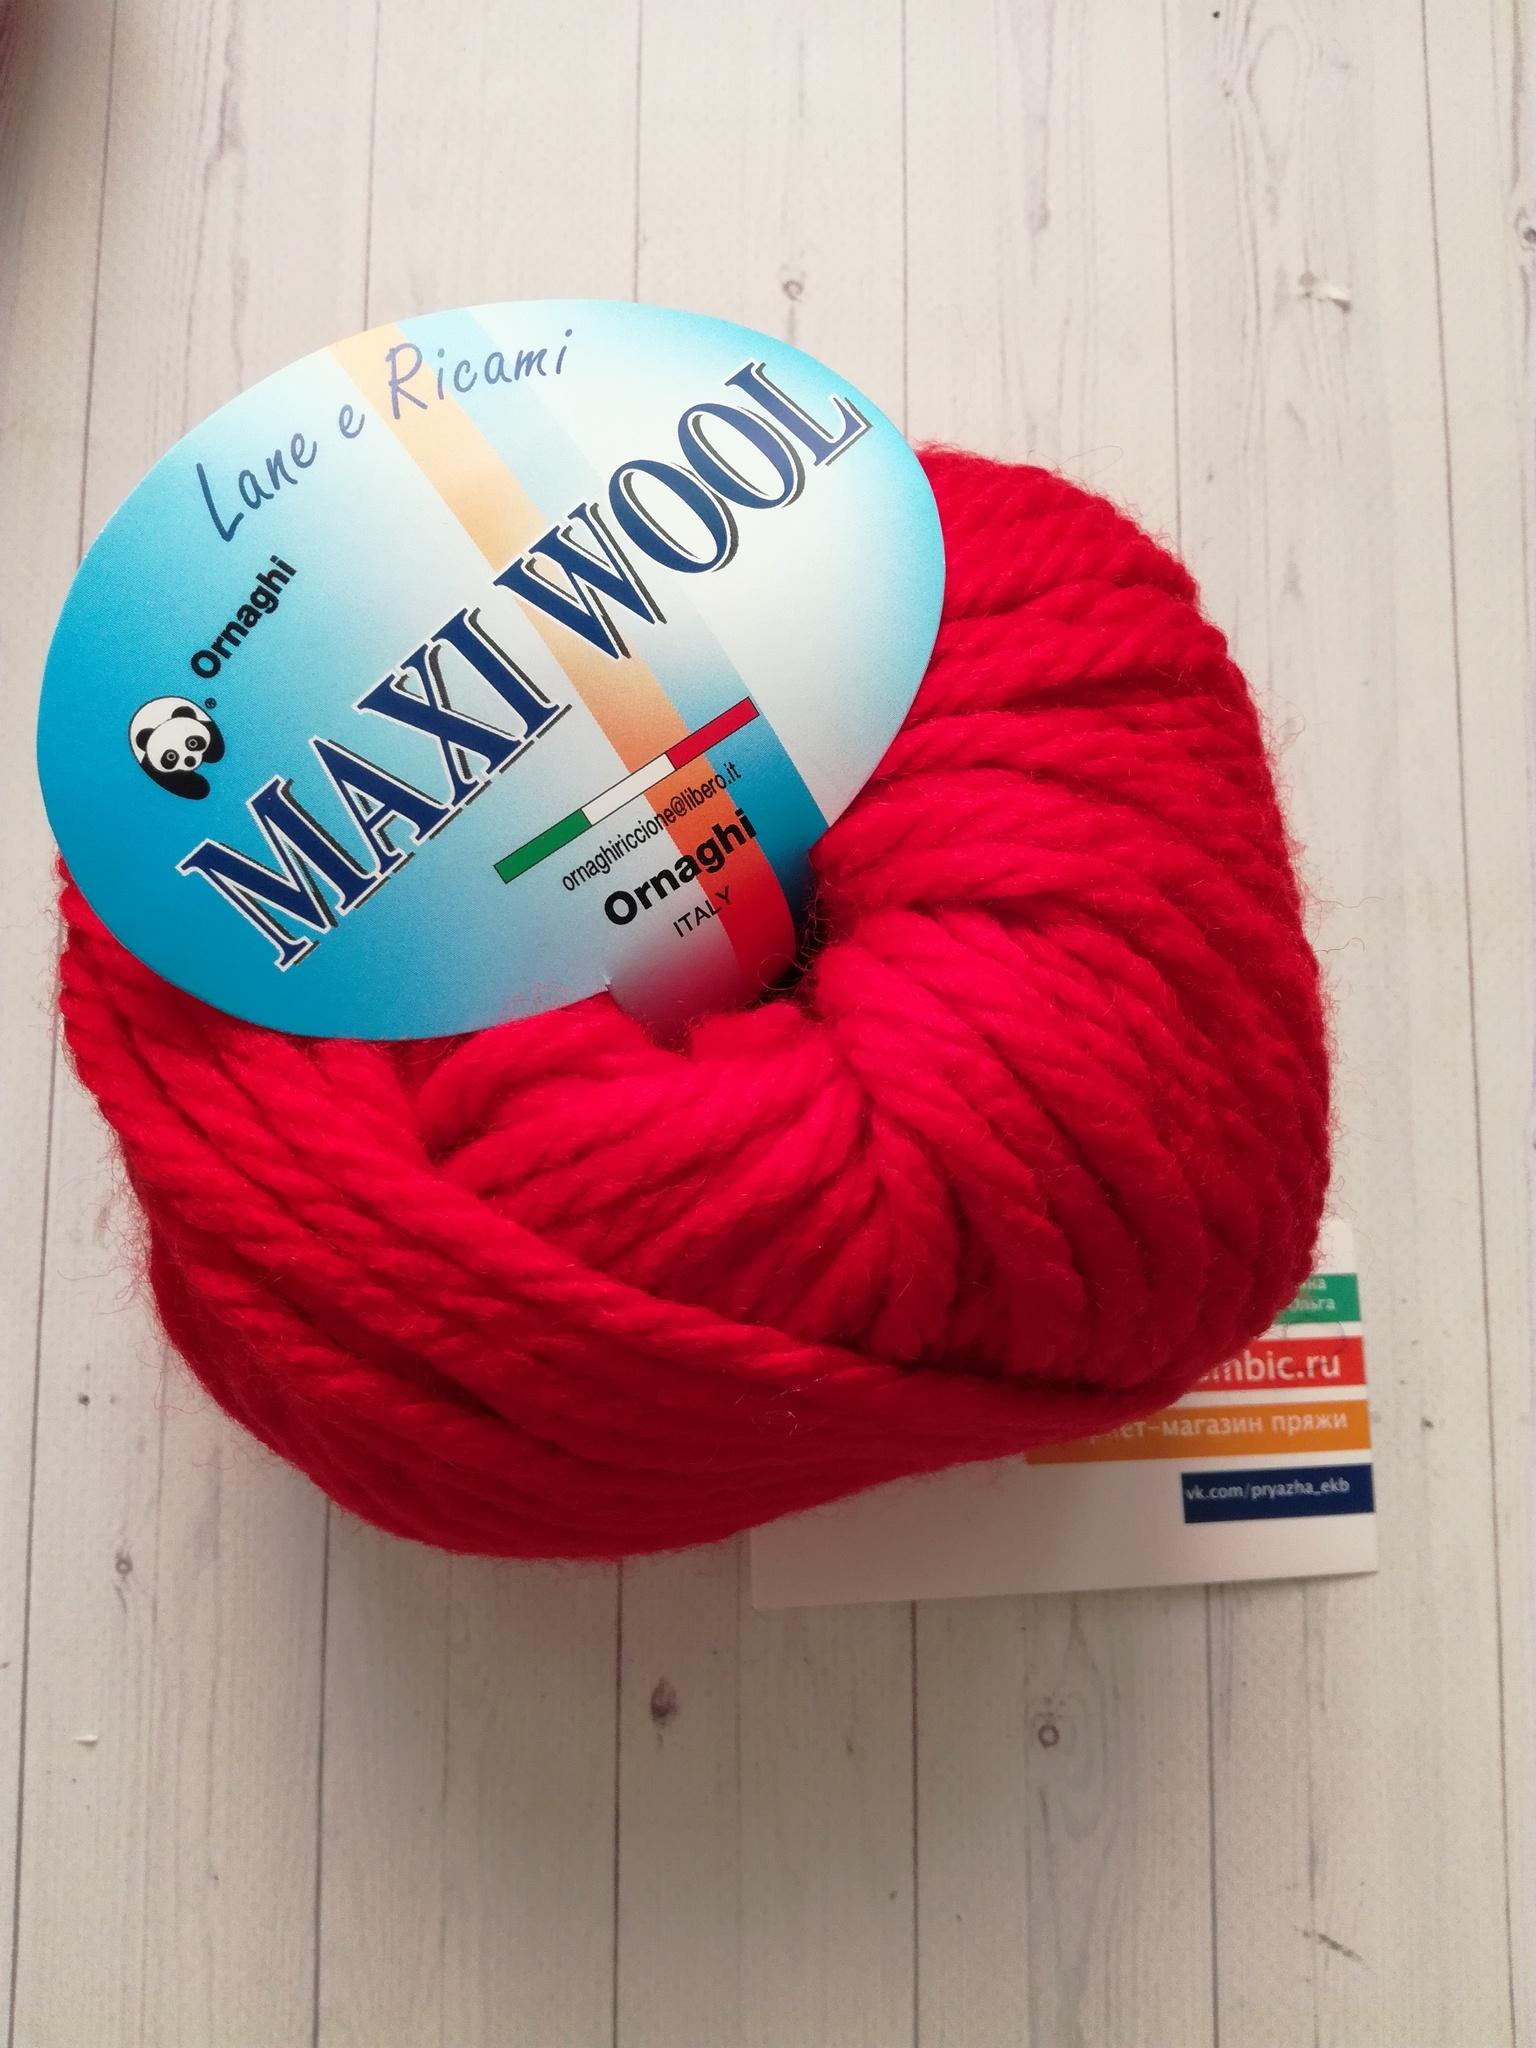 Пряжа Ornaghi Maxi Wool красный 17